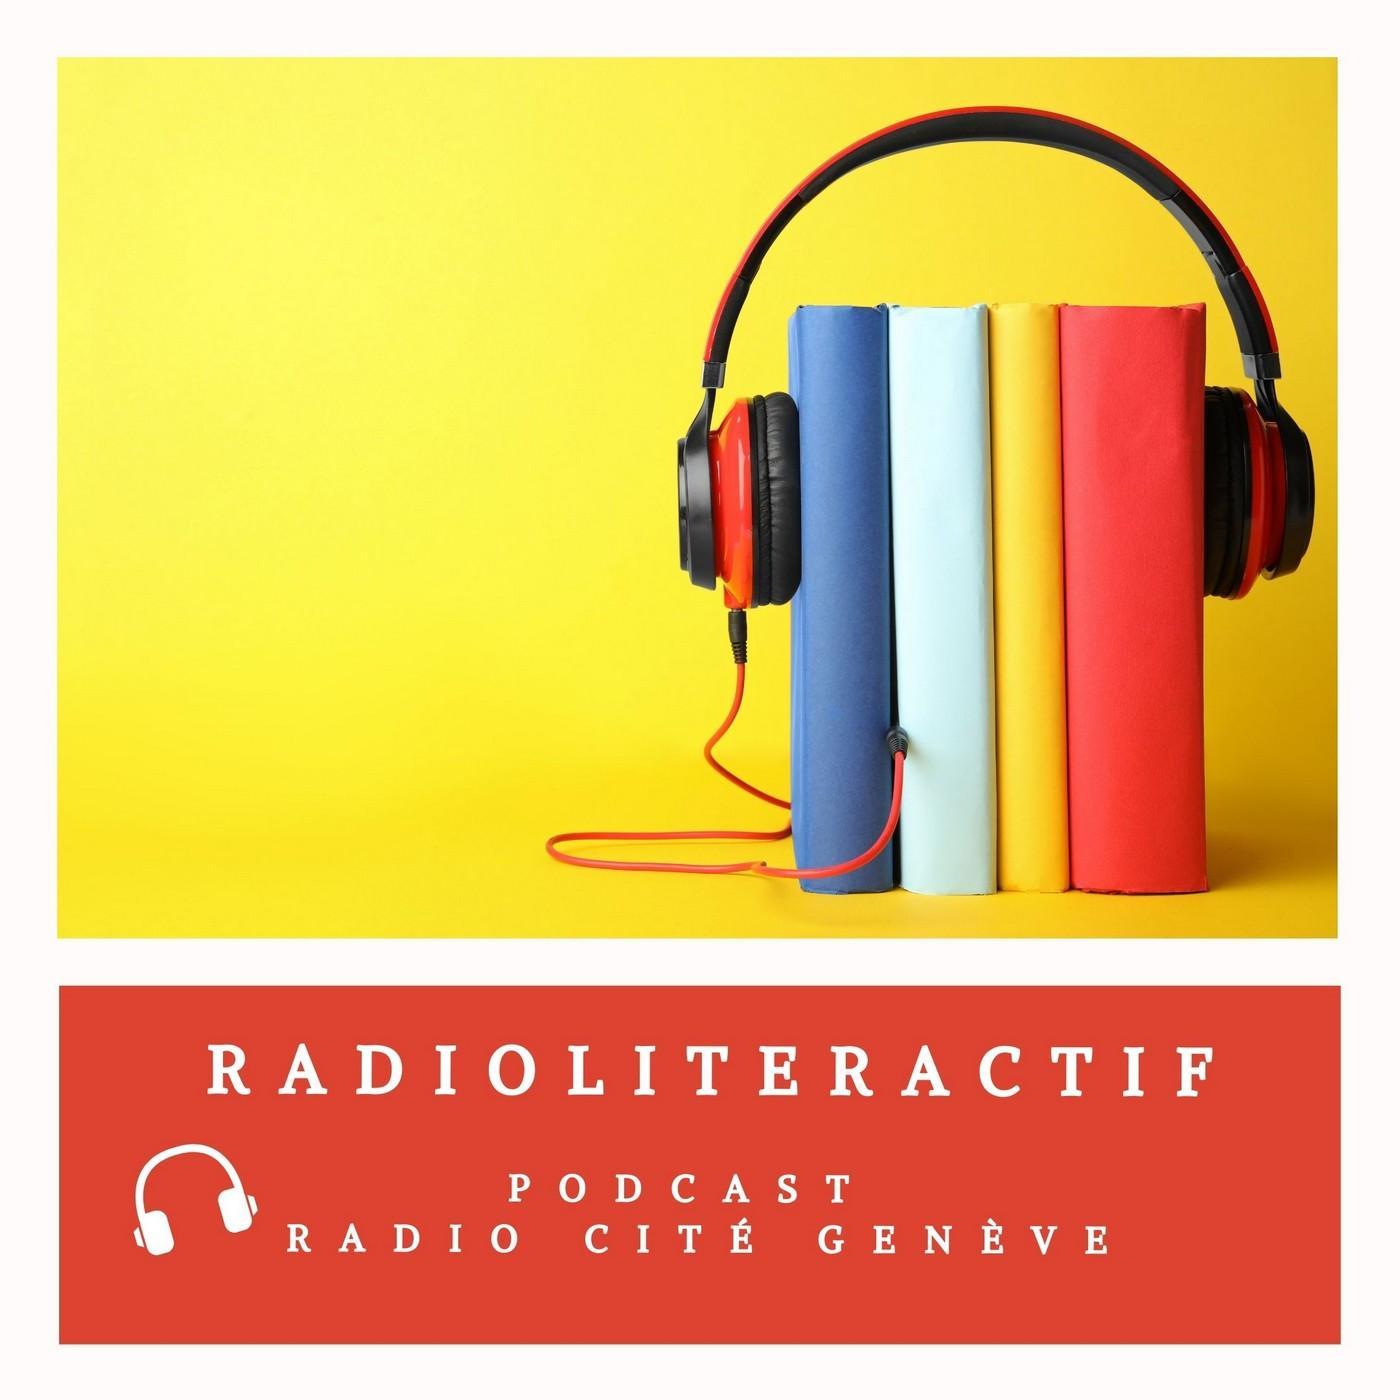 Radioliteractif du 29/03/2021 -Eric de Kermel